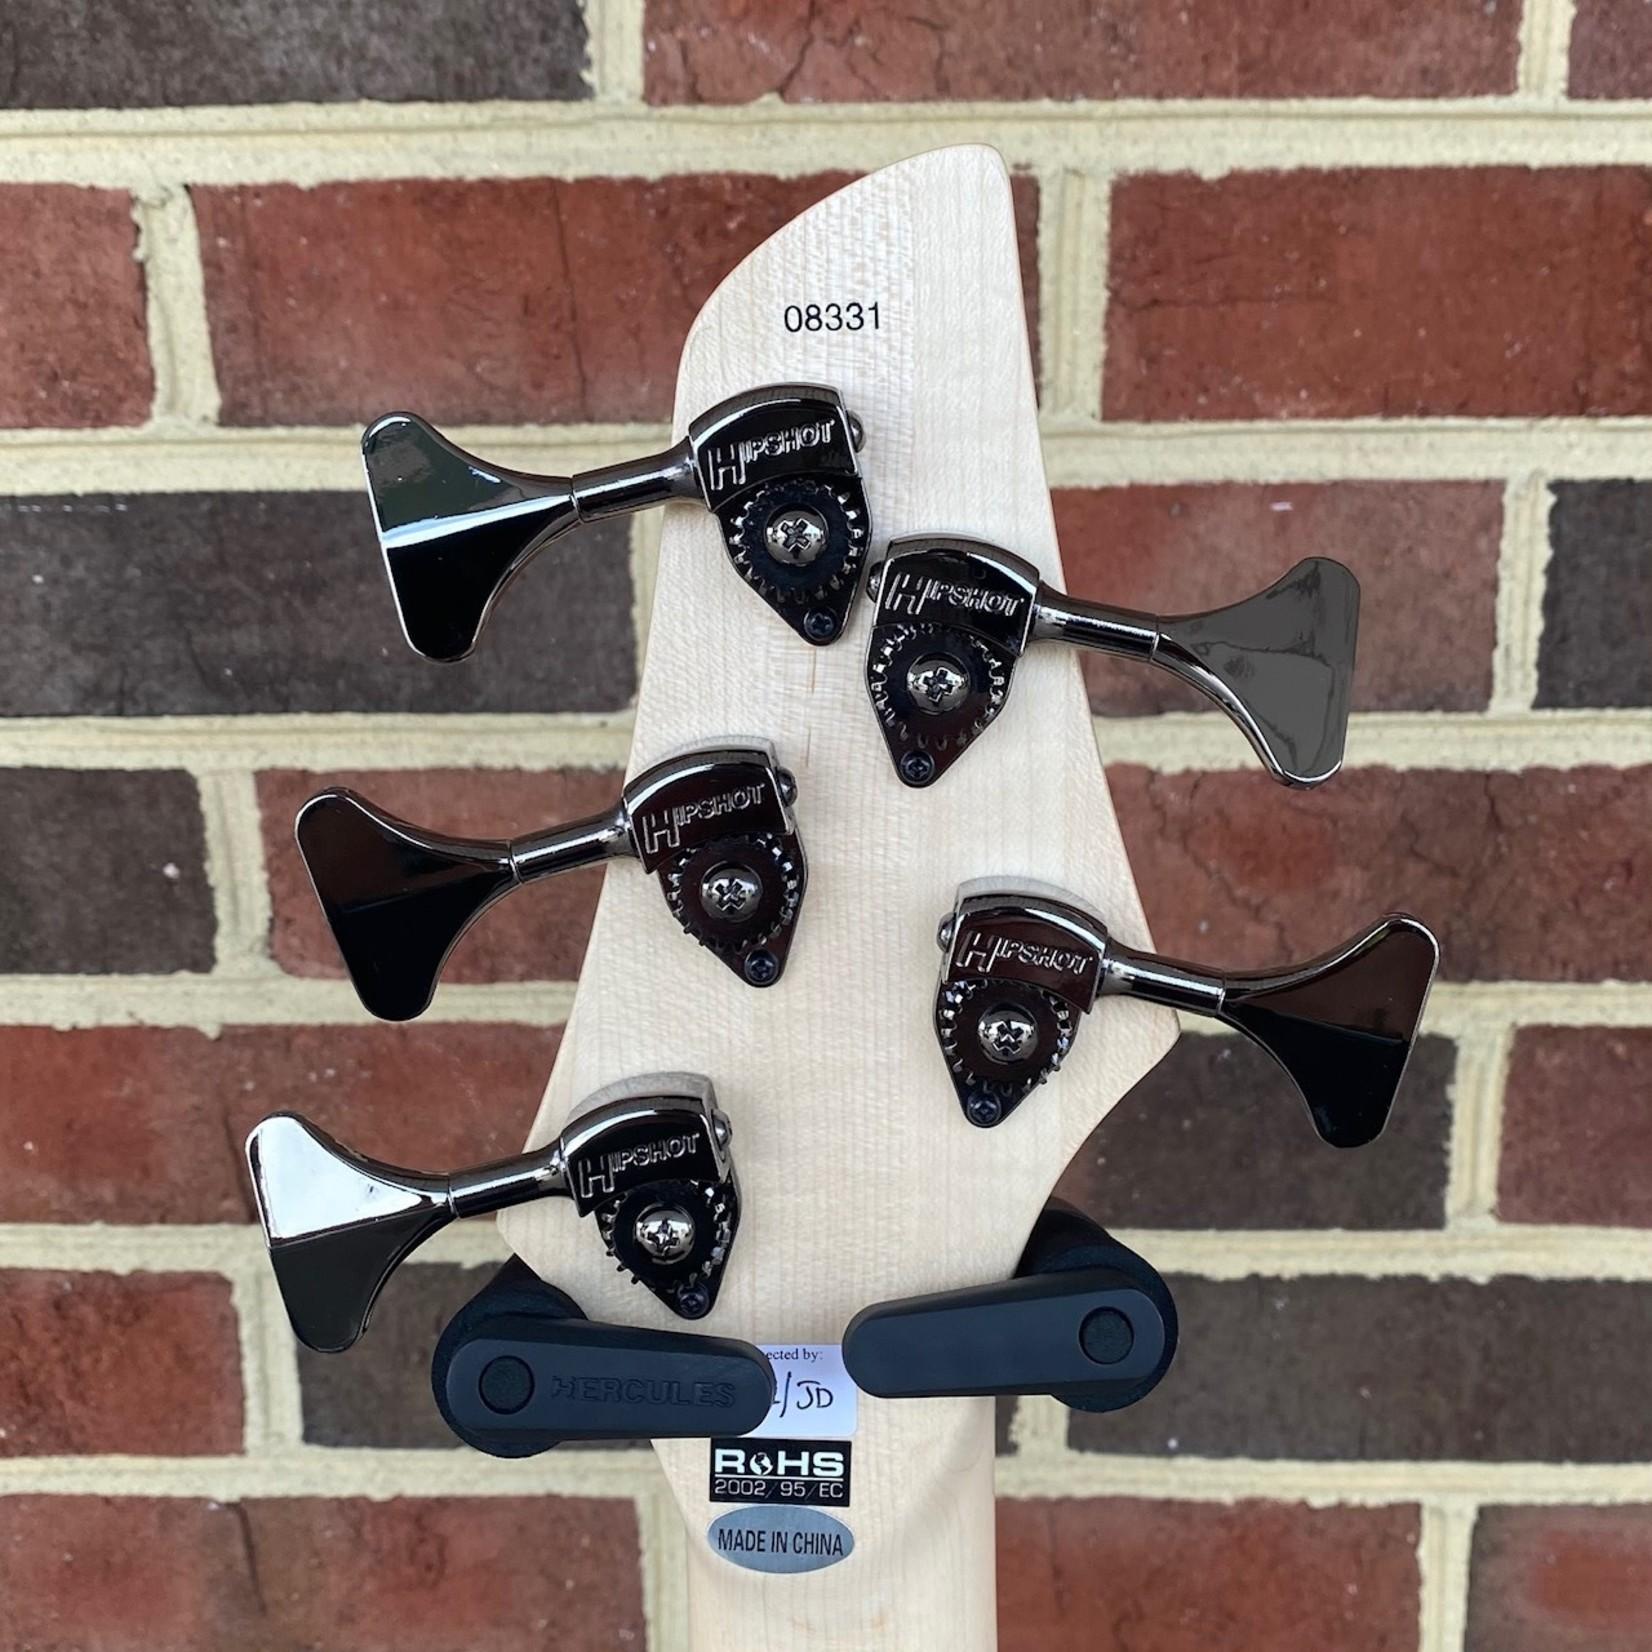 Dingwall Dingwall NG3 5-String, Black, Maple Fretboard, Matching Headstock, Gig Bag